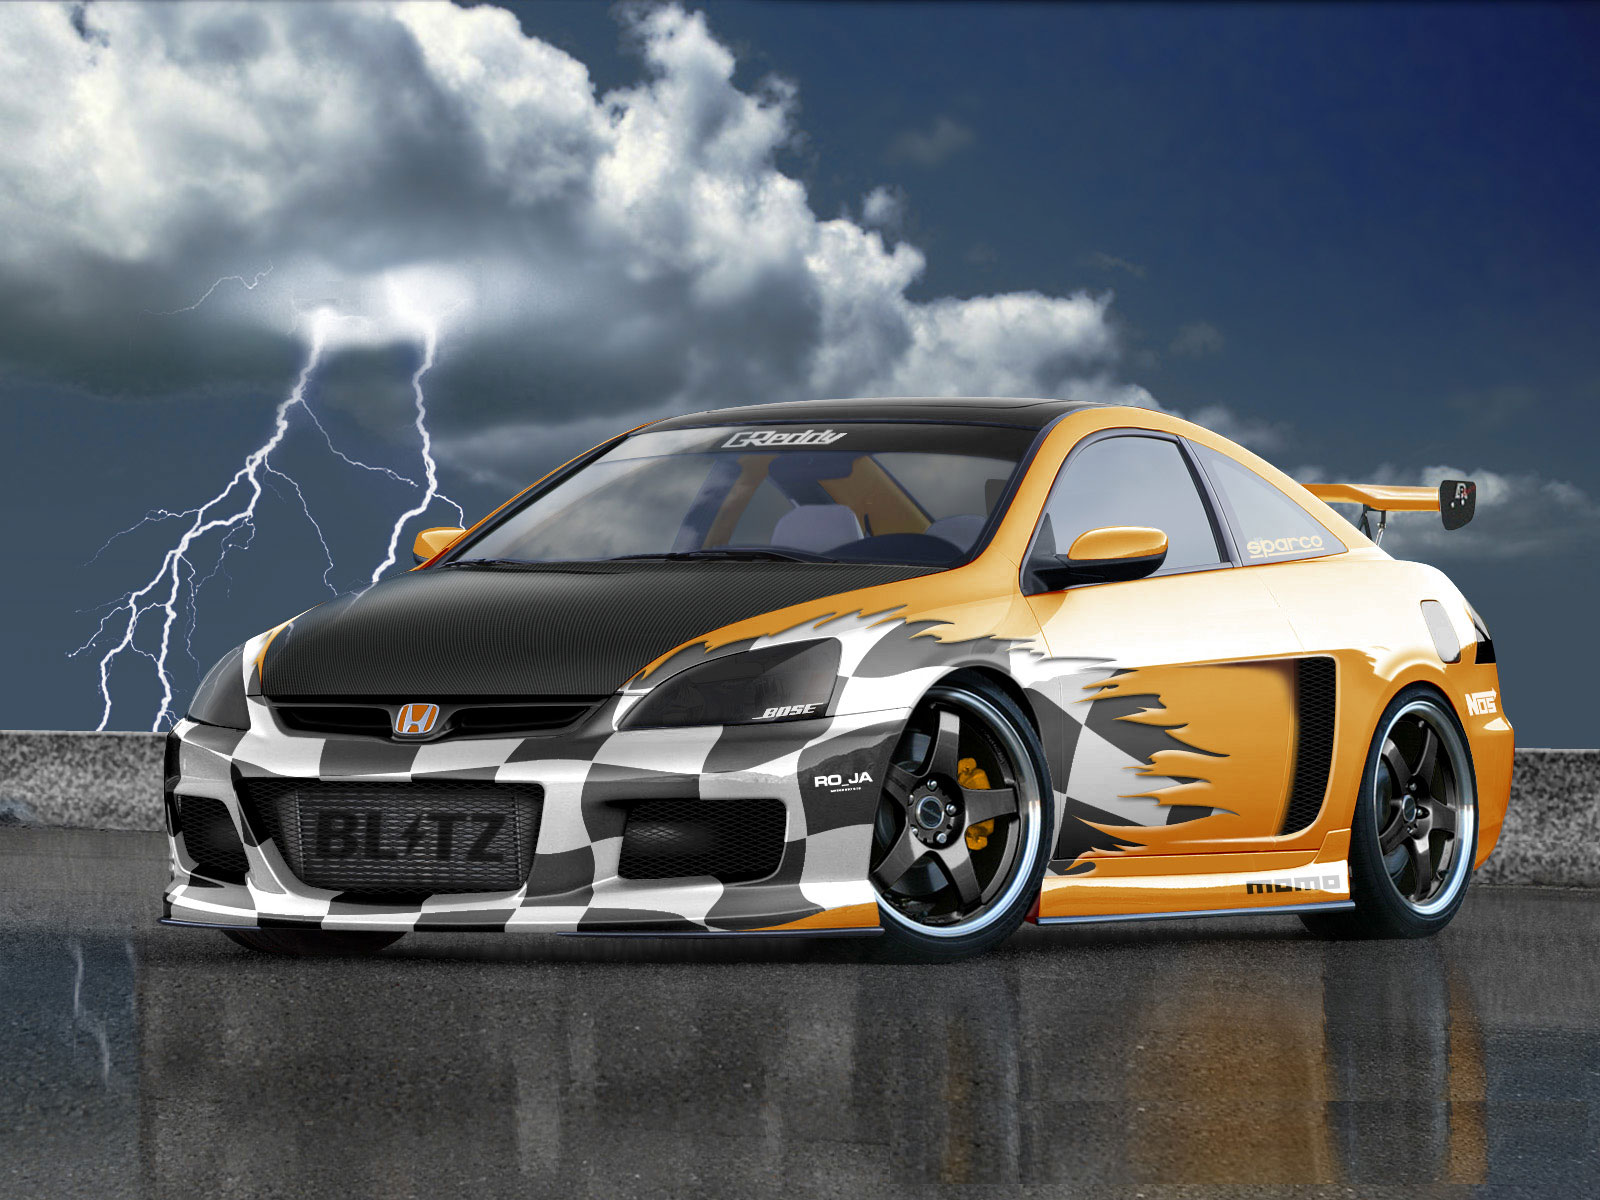 Sport Wallpaper Autos: Cool Car Wallpapers